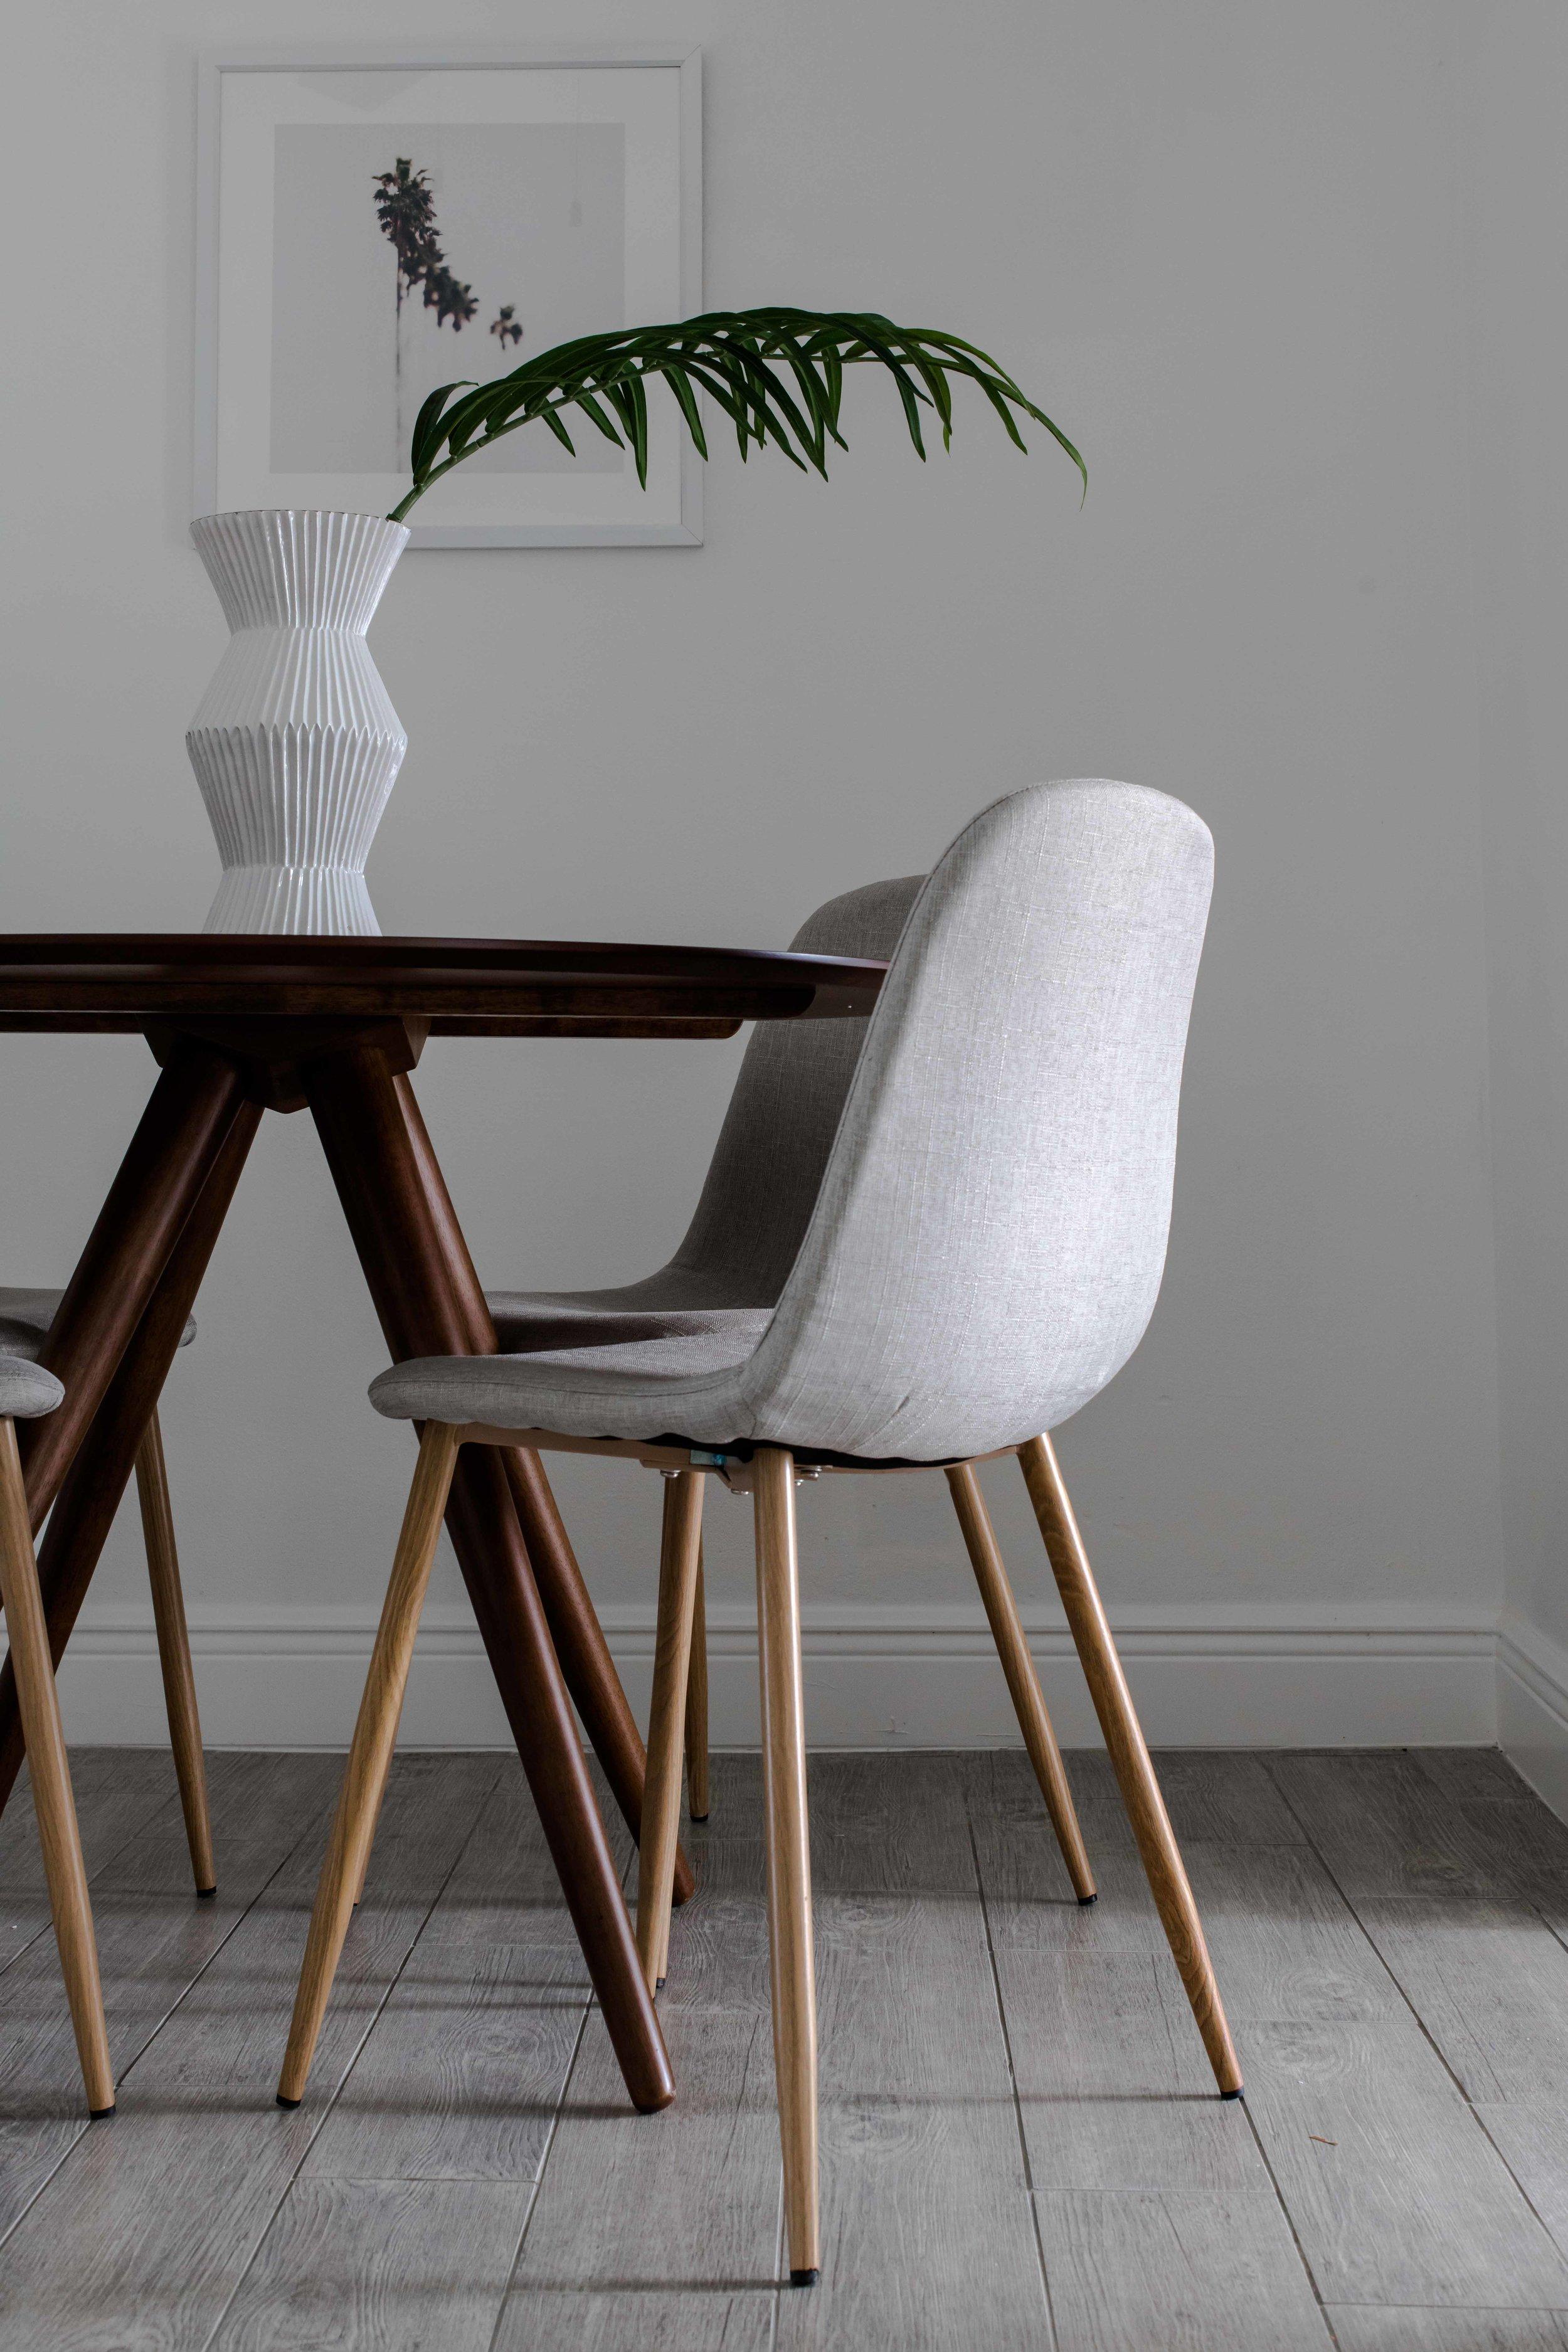 Sonder Stays Miami Interior Design Photographer Lifestyle Home Interiors Photography-17.jpg